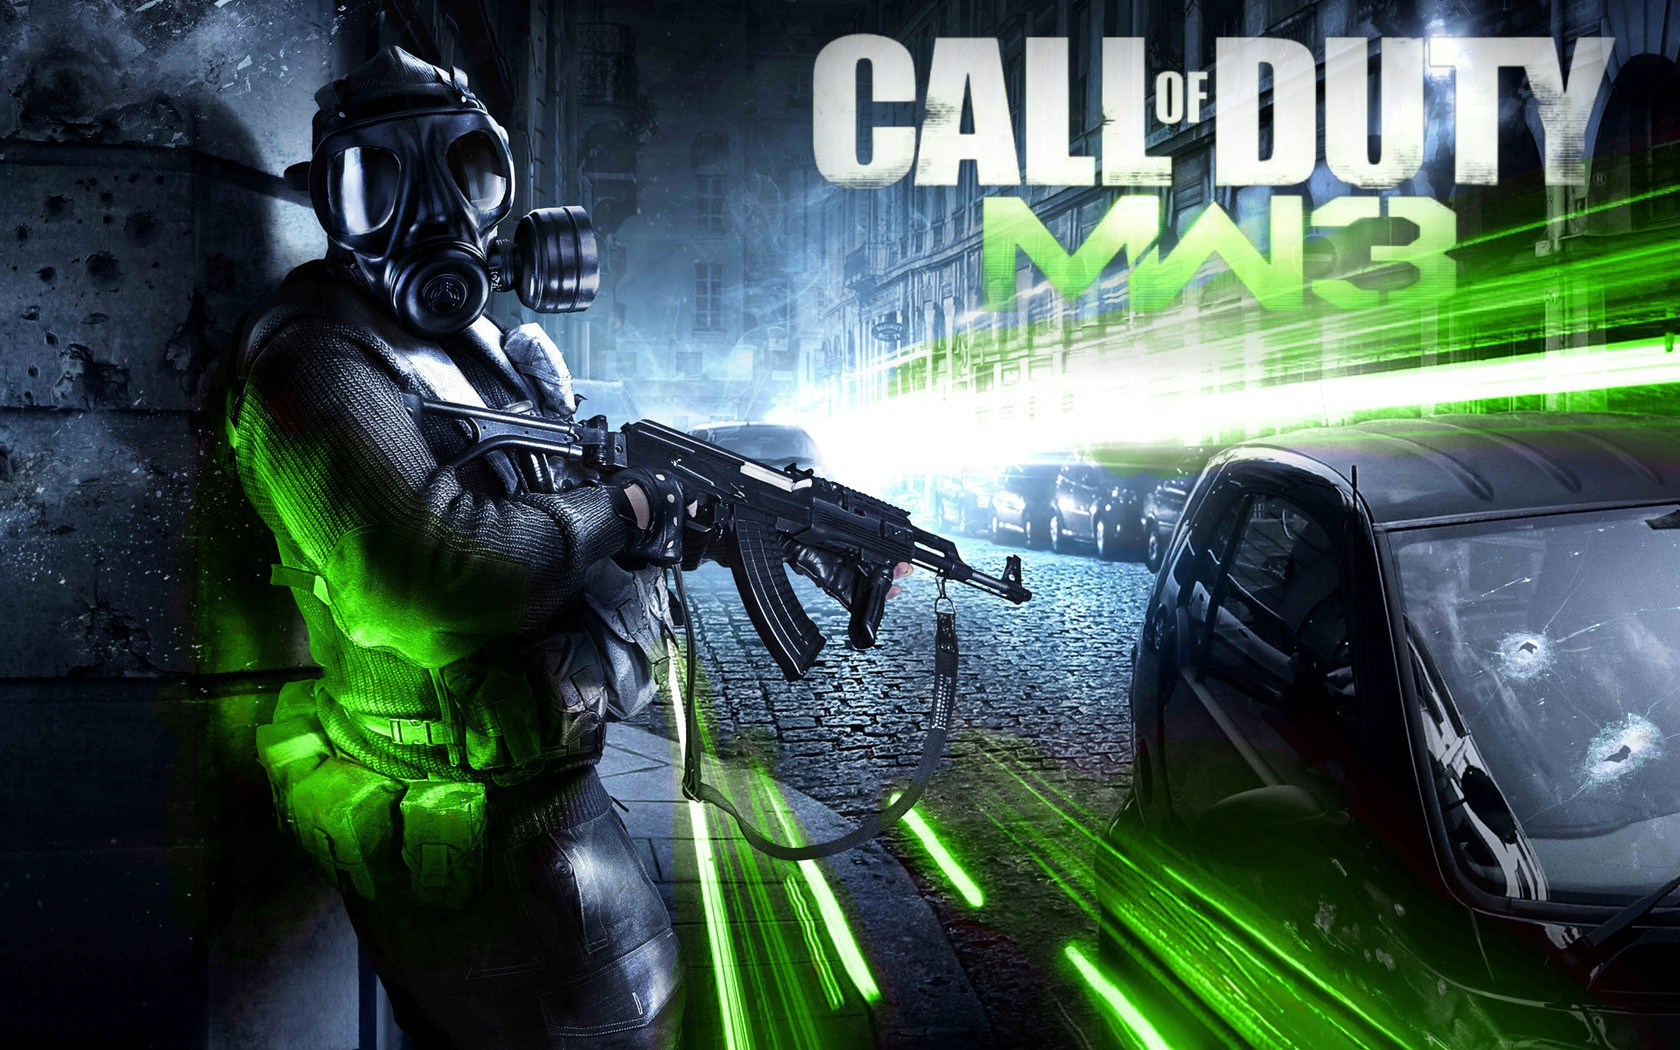 call of duty advanced warfare download torrent